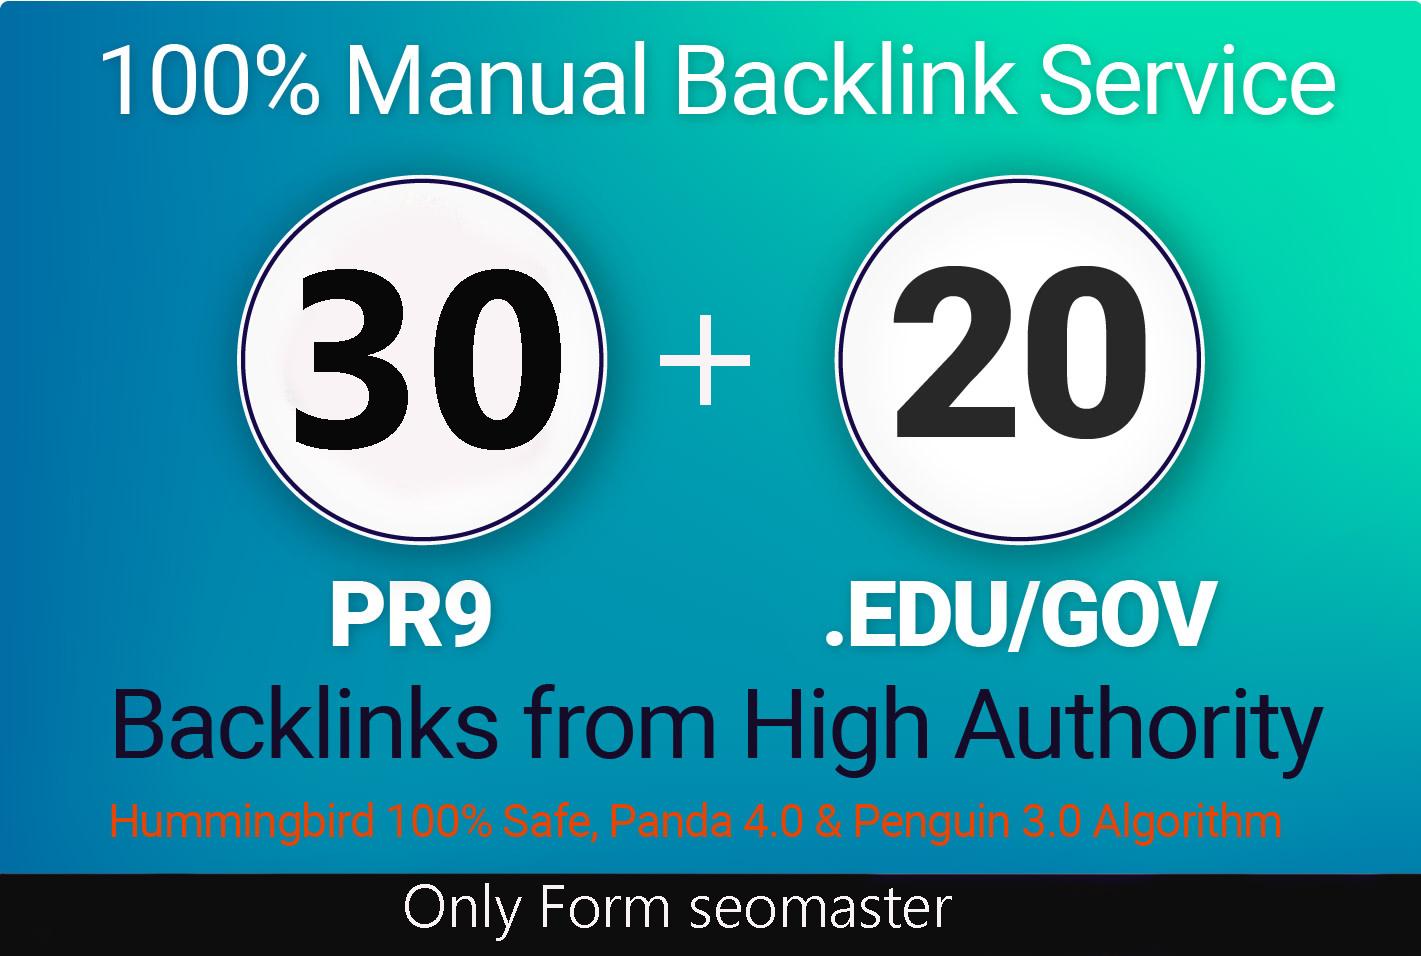 I Will Do Manualy 30 Pr9 + 20 Edu - Gov High PR SEO Authority Backlinks - Fire Your Google Ranking f